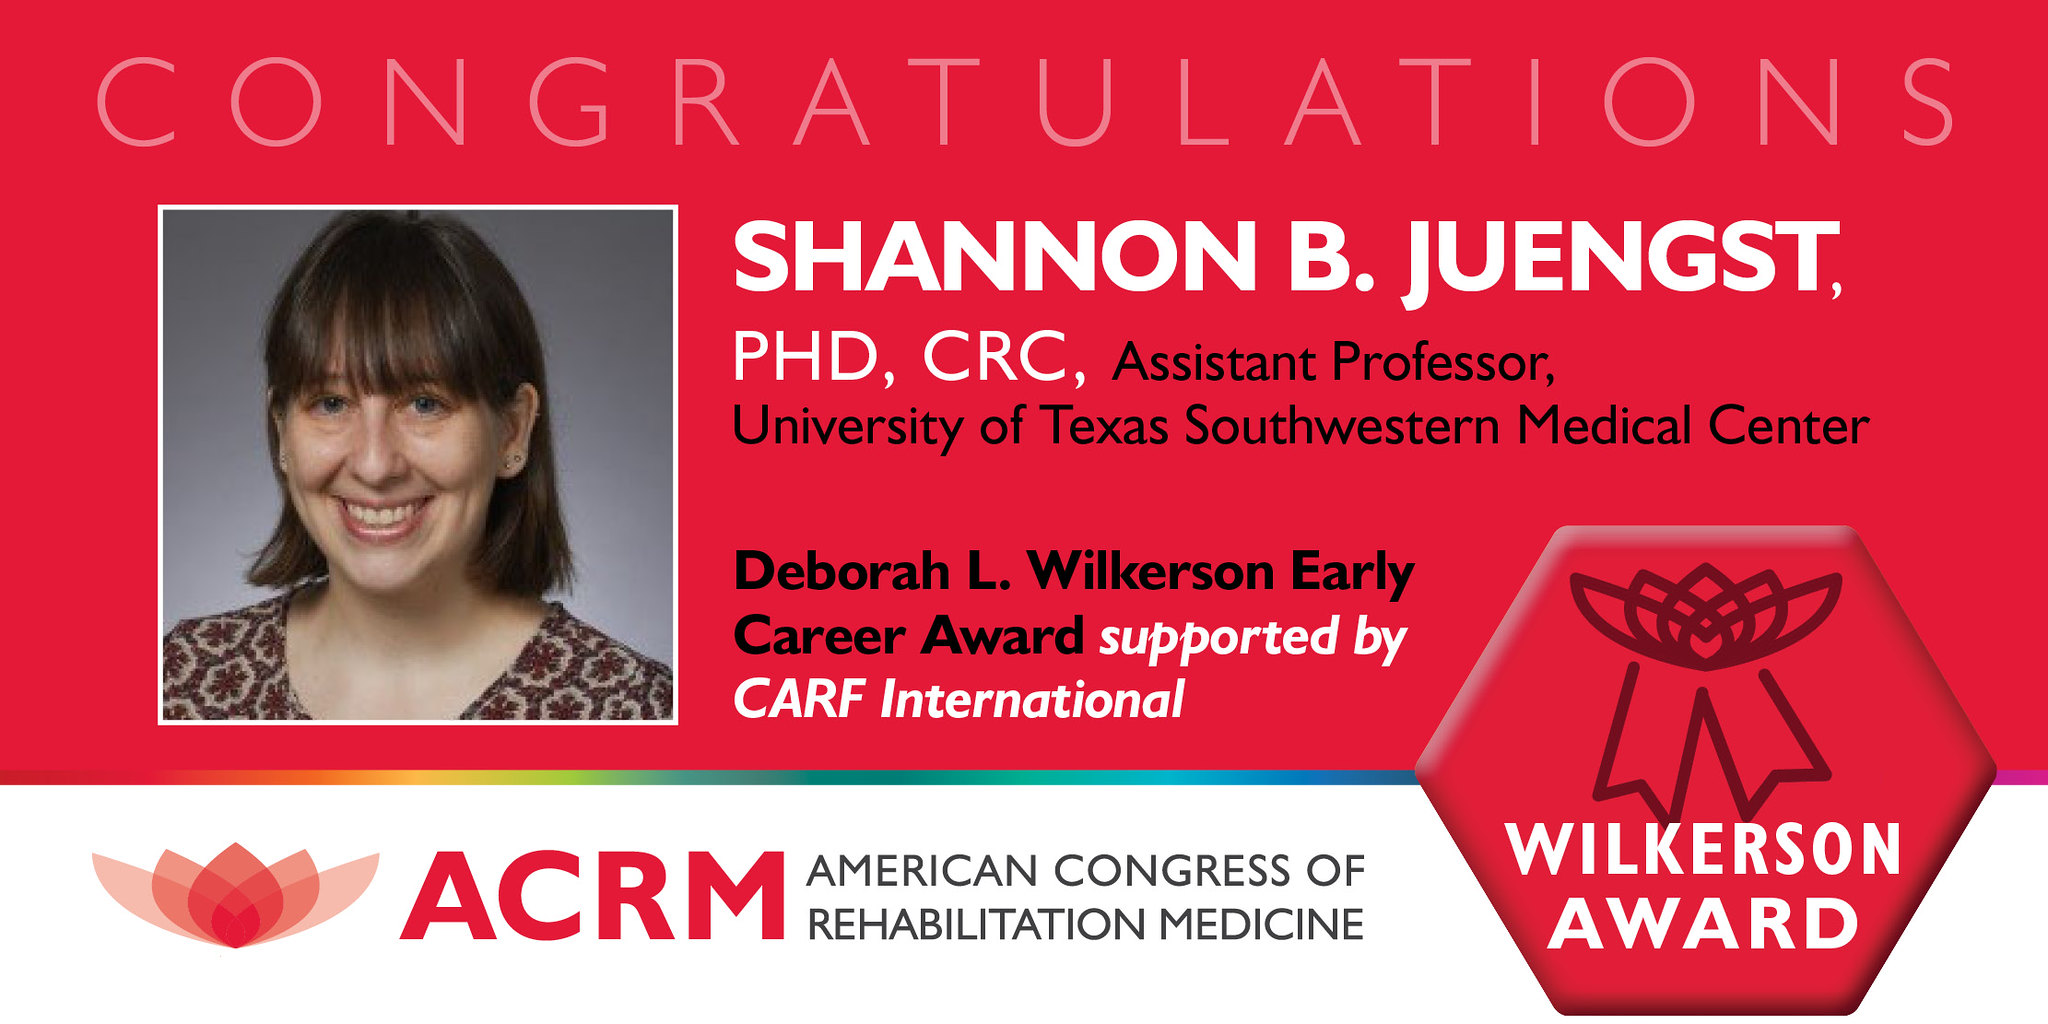 Deborah L. Wilkerson Award 2020 Recipient Shannon Juengst